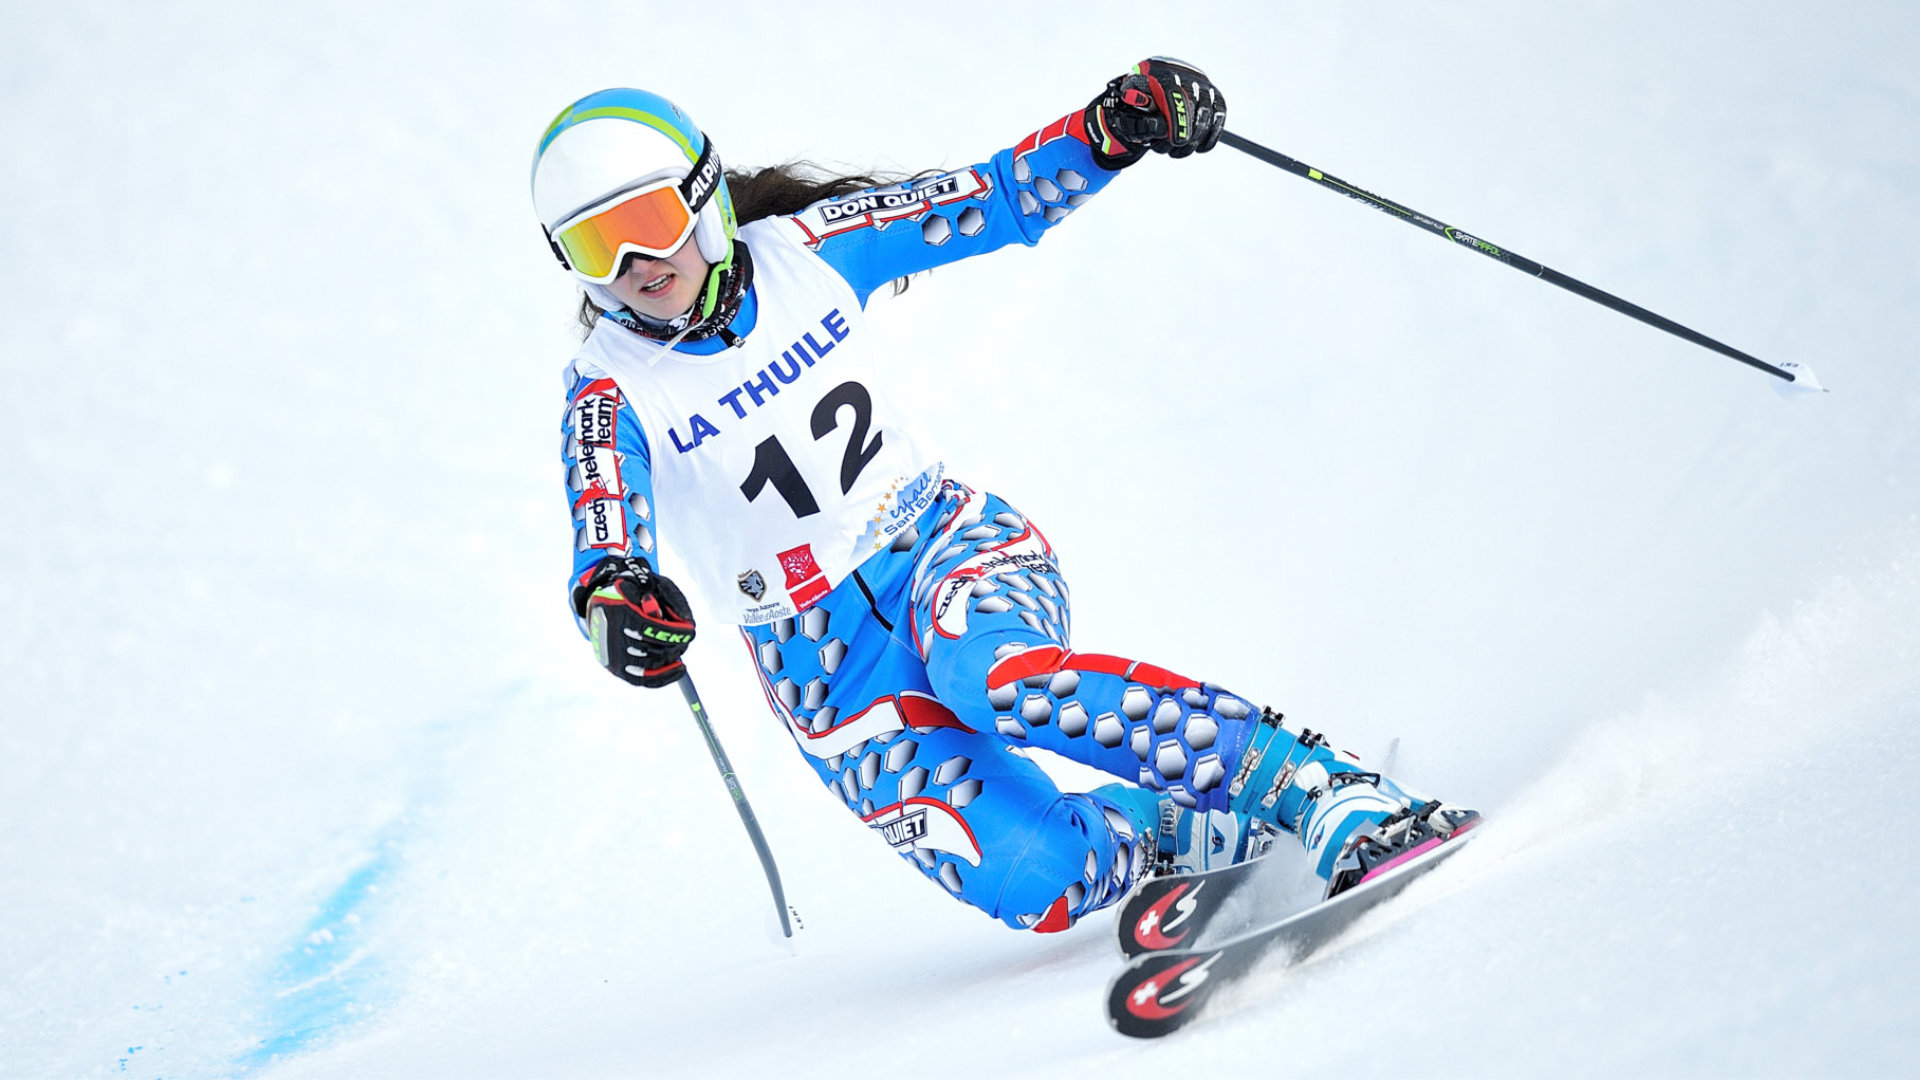 20.01.2017- FIS Telemark World Cup 2016-2017 La Thuile - Start R